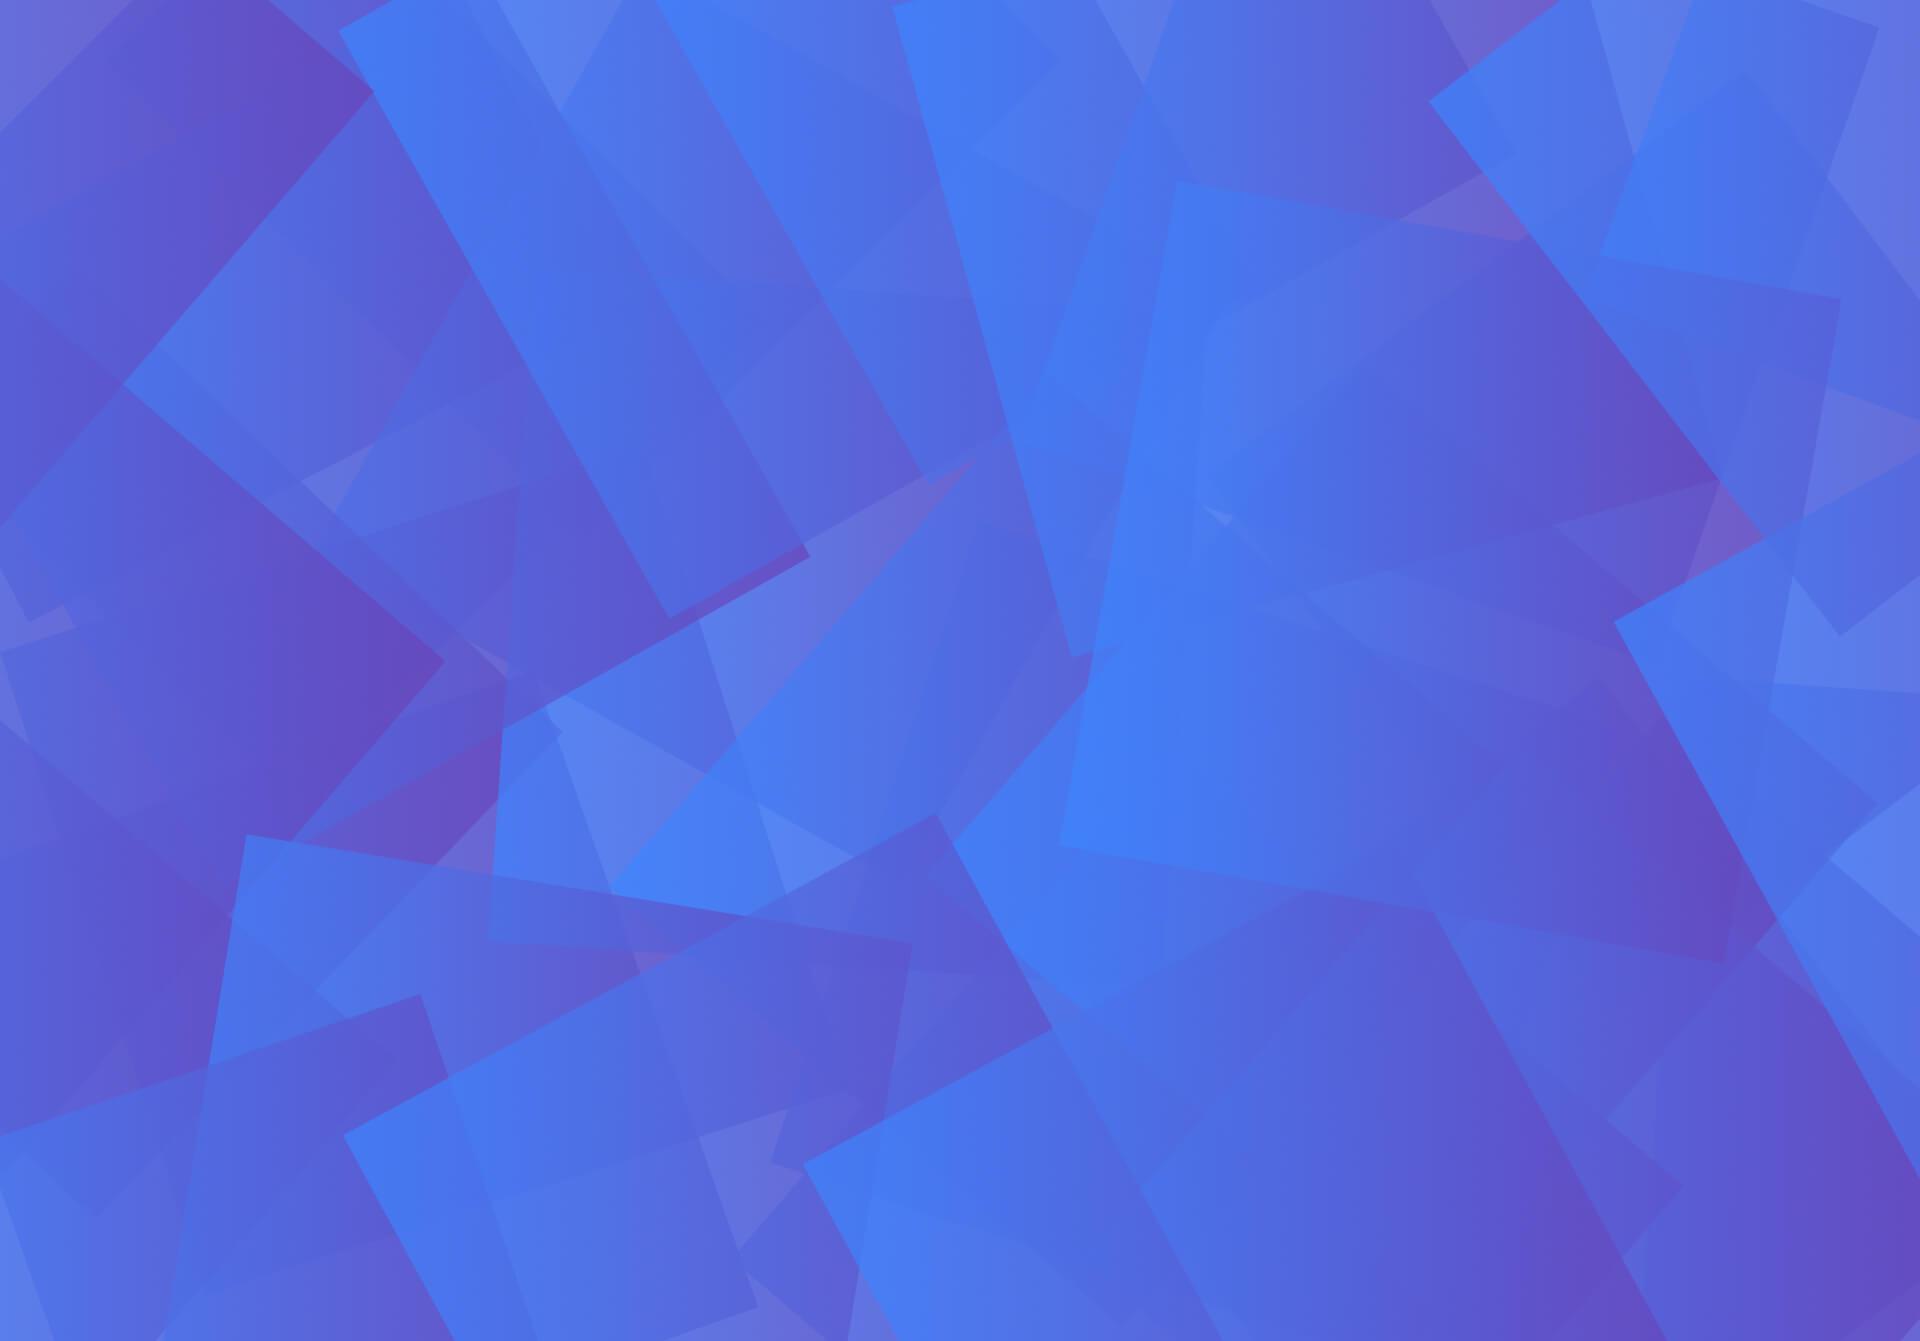 fond de carré bleu